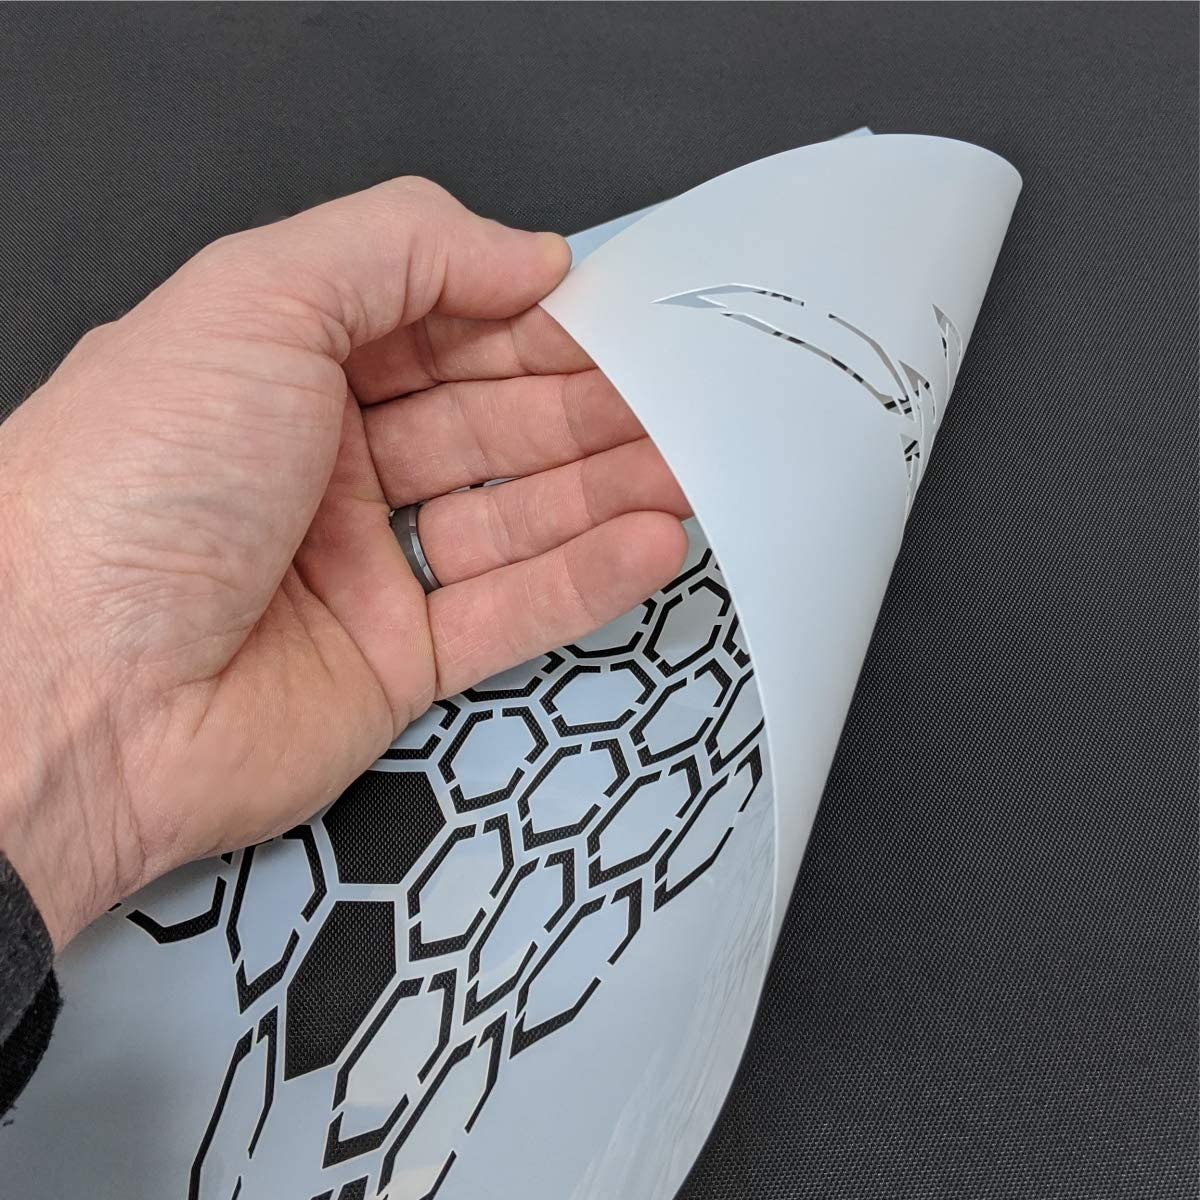 Redleg Camo 12 HEX 3 Piece Camo Stencil Kit